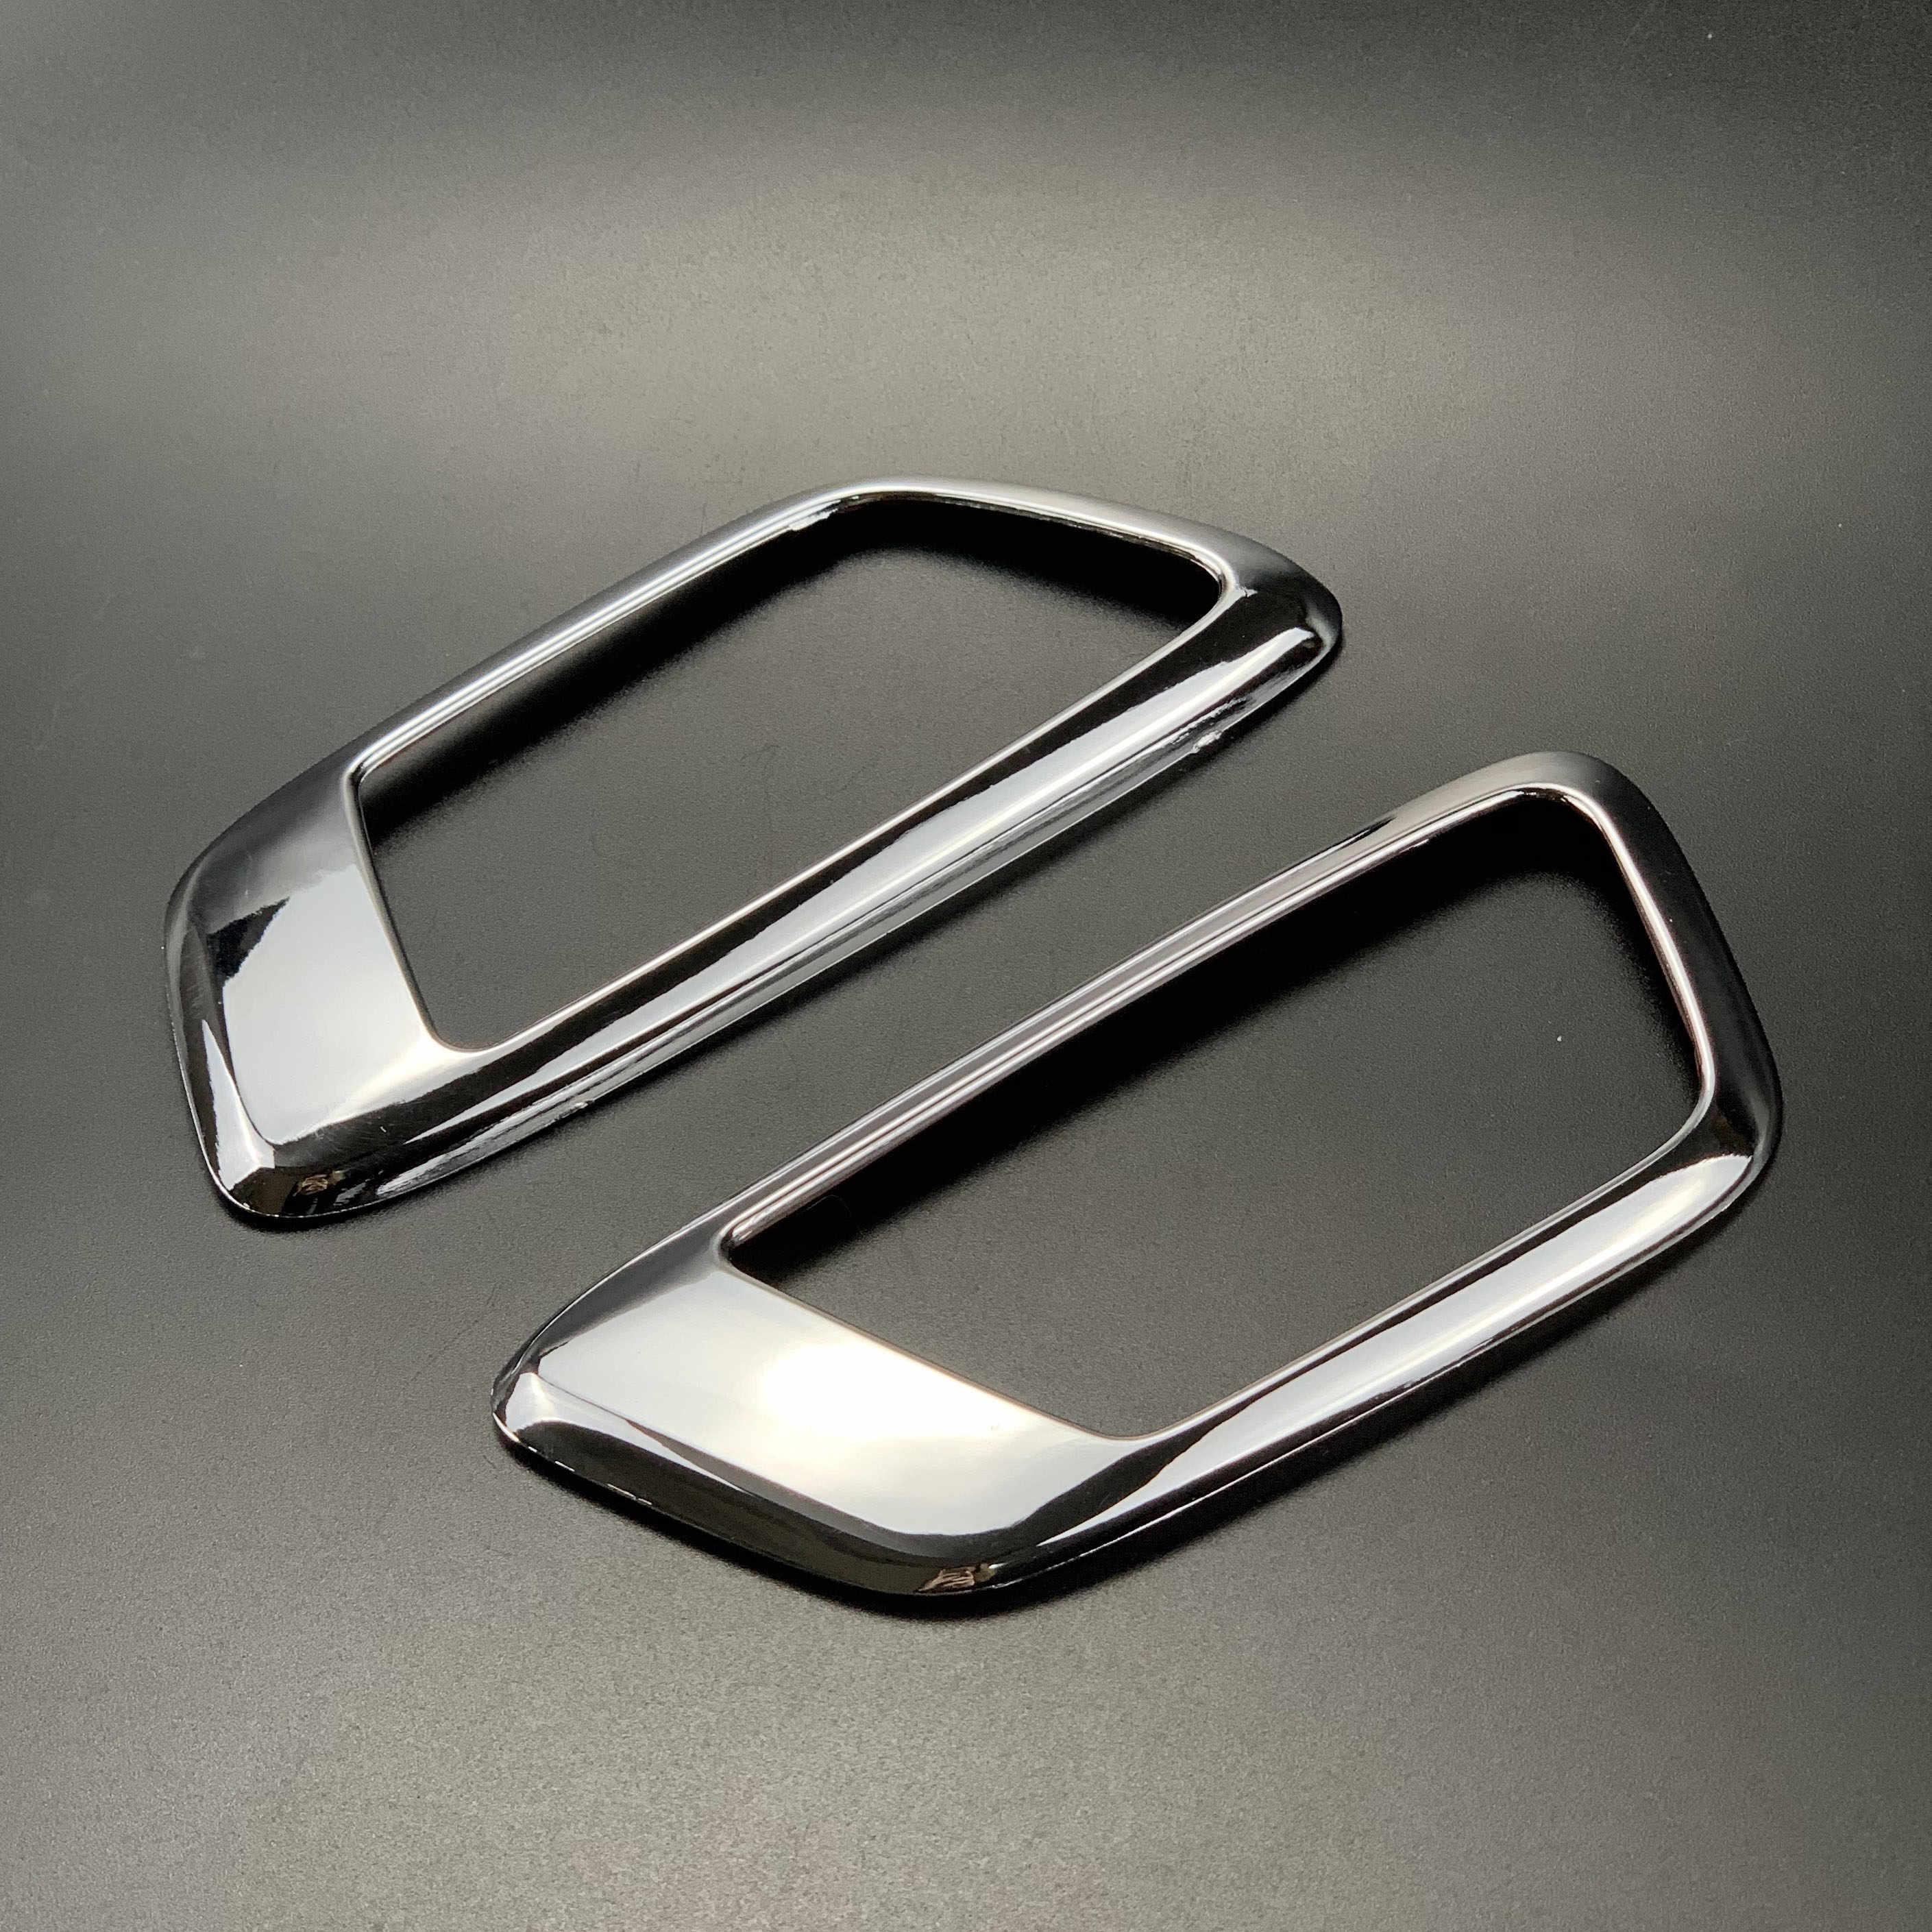 XLTWKK Couvercle de poign/ée de Porte de Bol de poign/ée de Porte en Chrome ABS pour Hyundai ix35 2010-2015